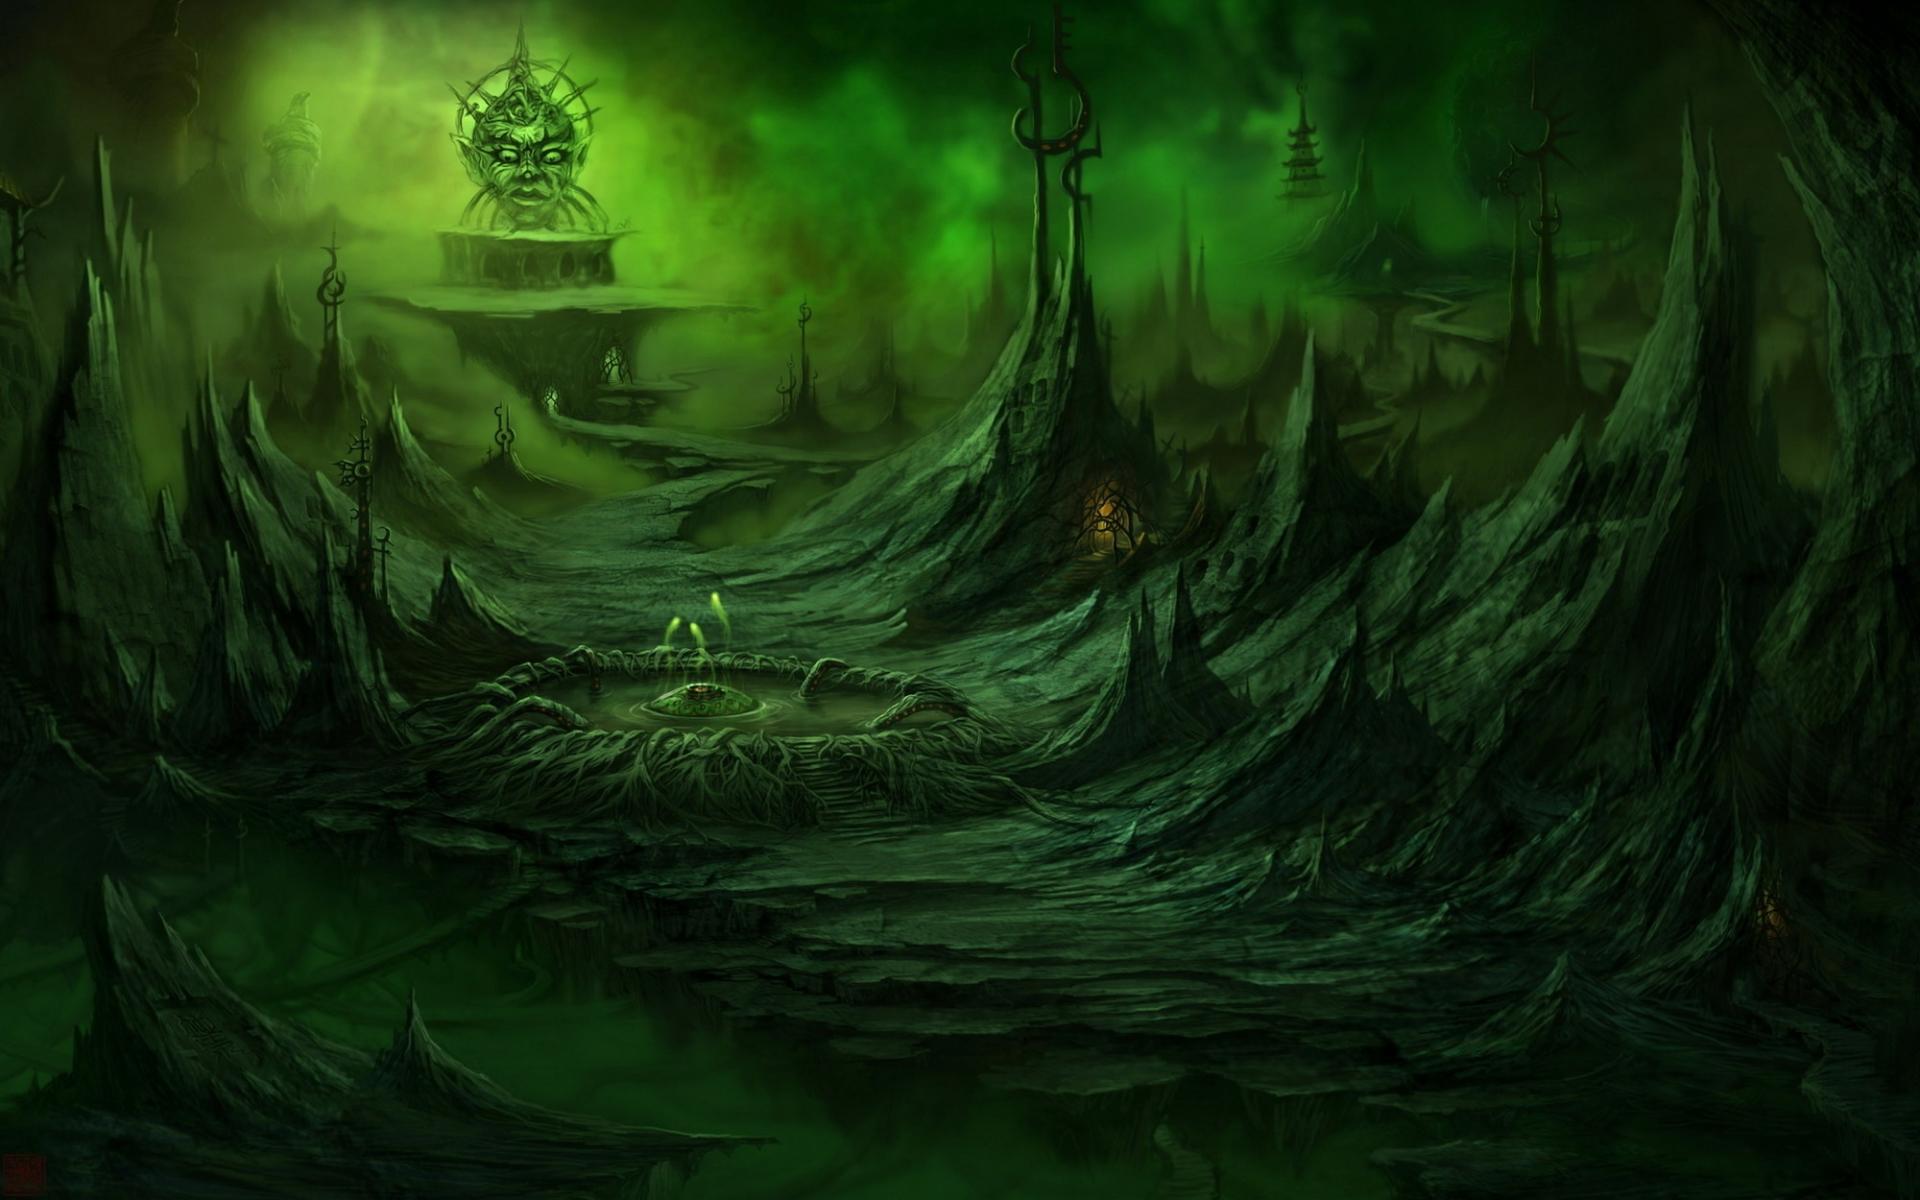 evil landscape background - photo #4